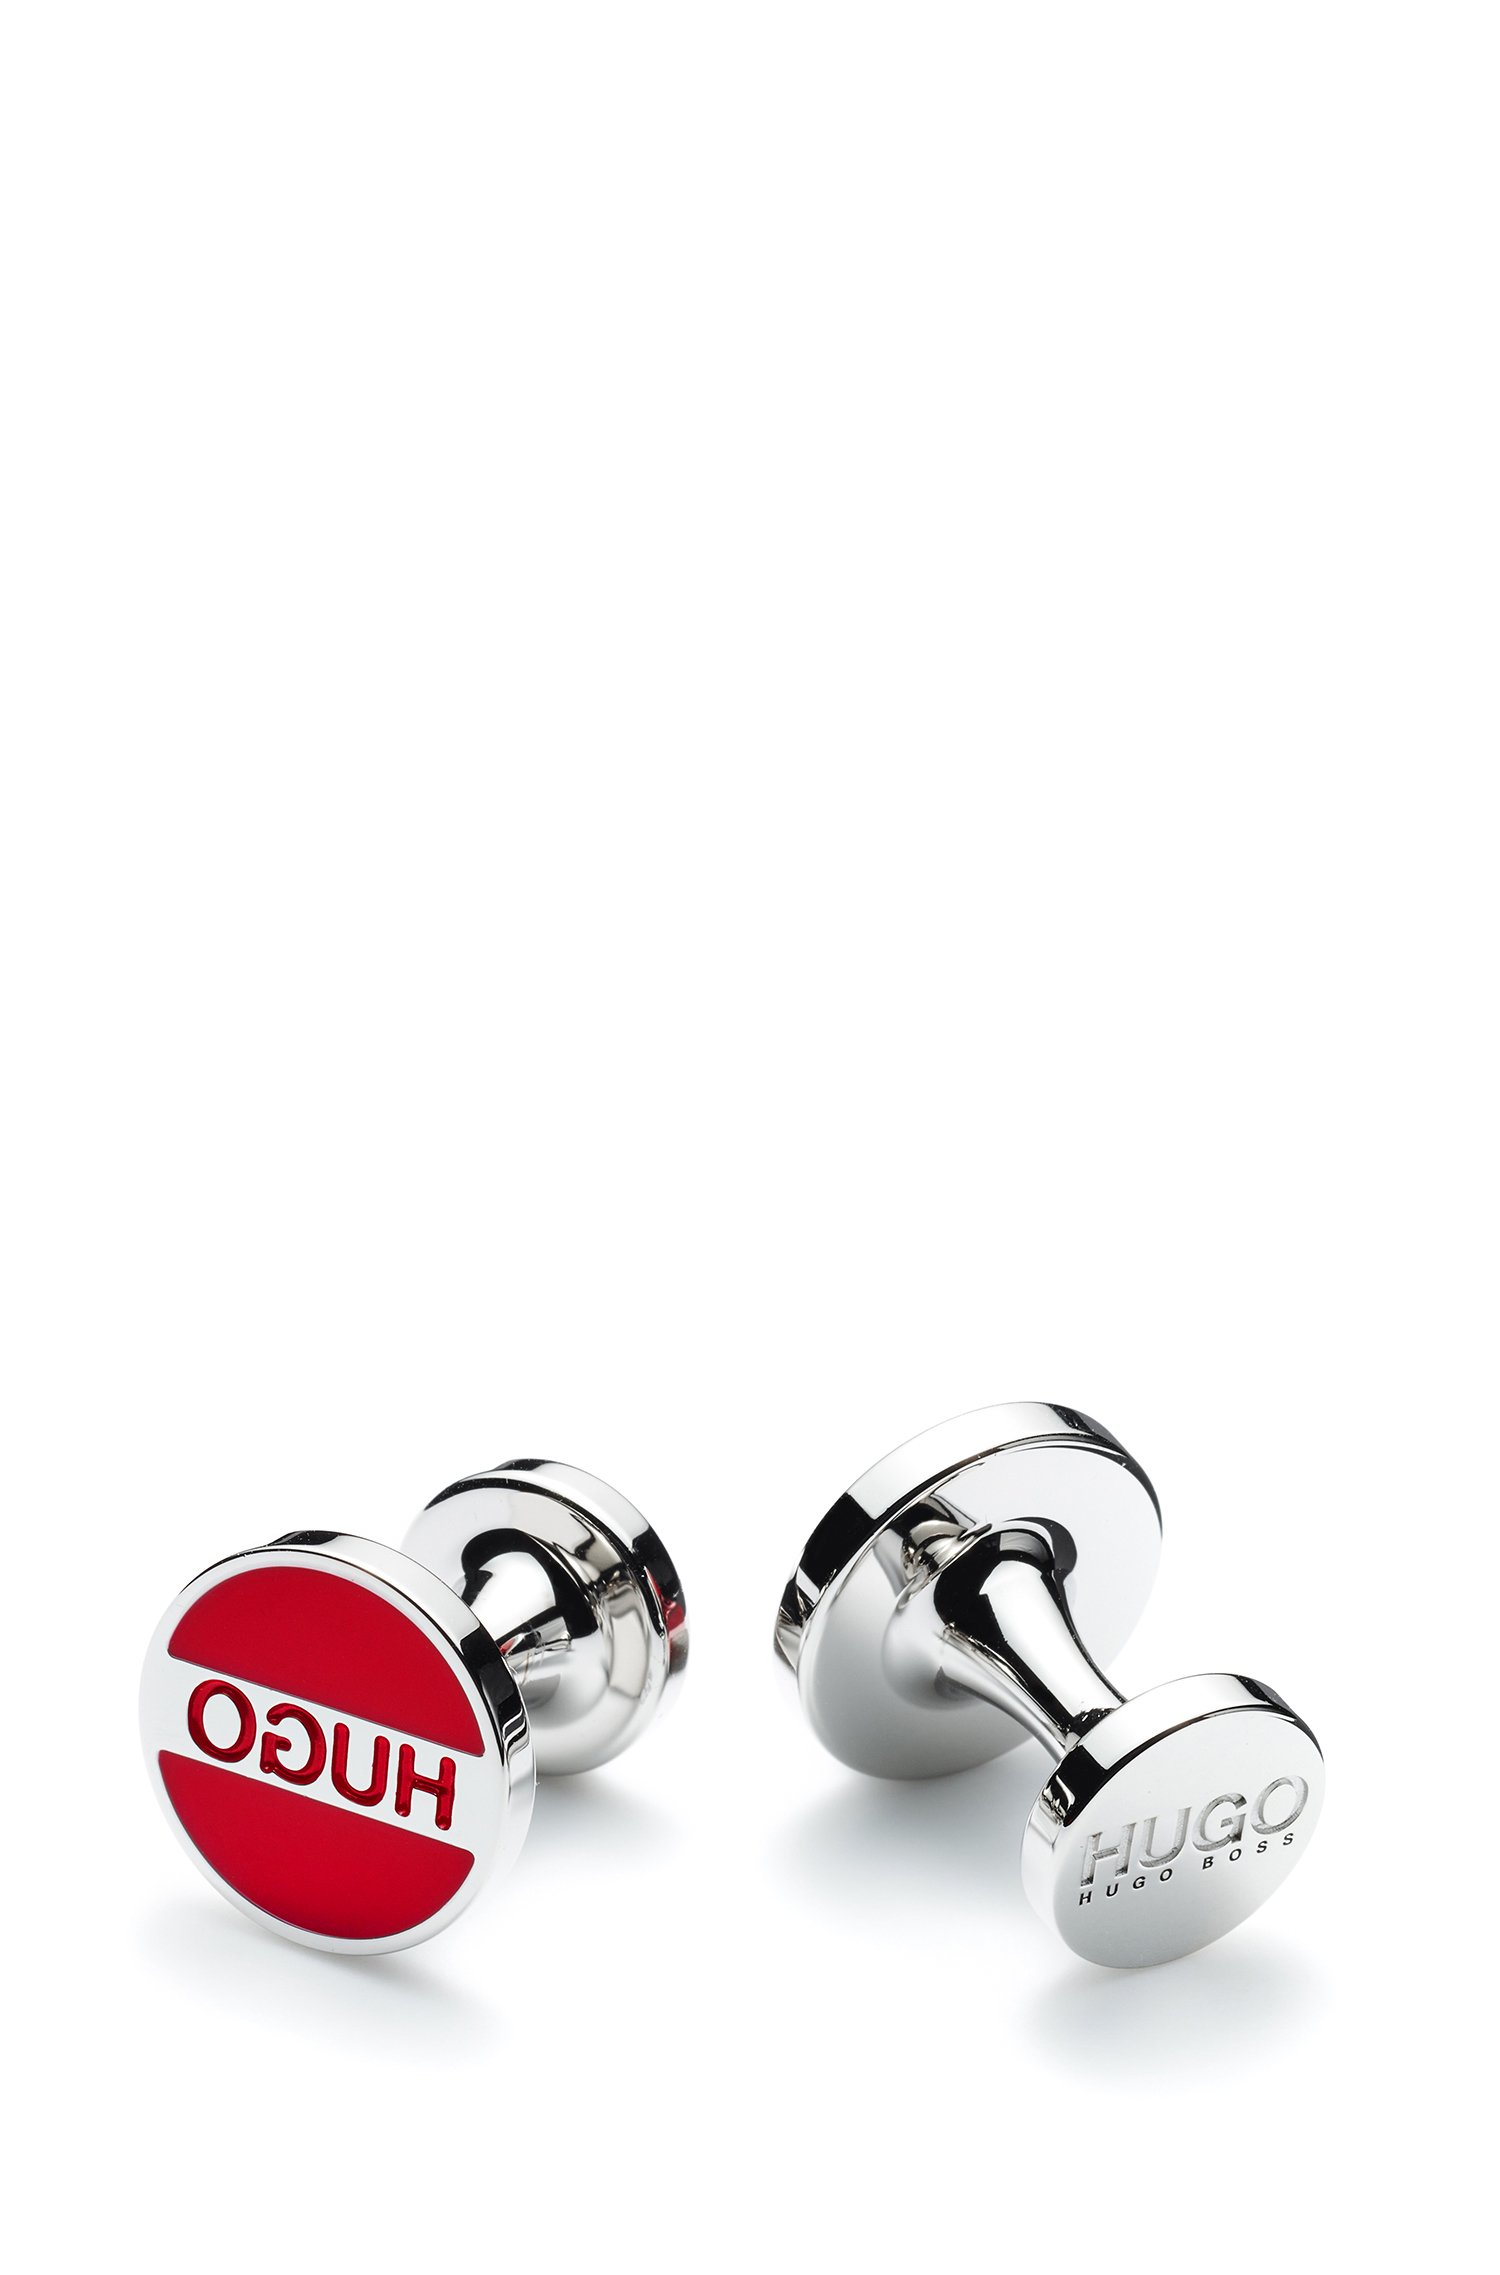 Black-enamel cufflinks with reversed logo, Red